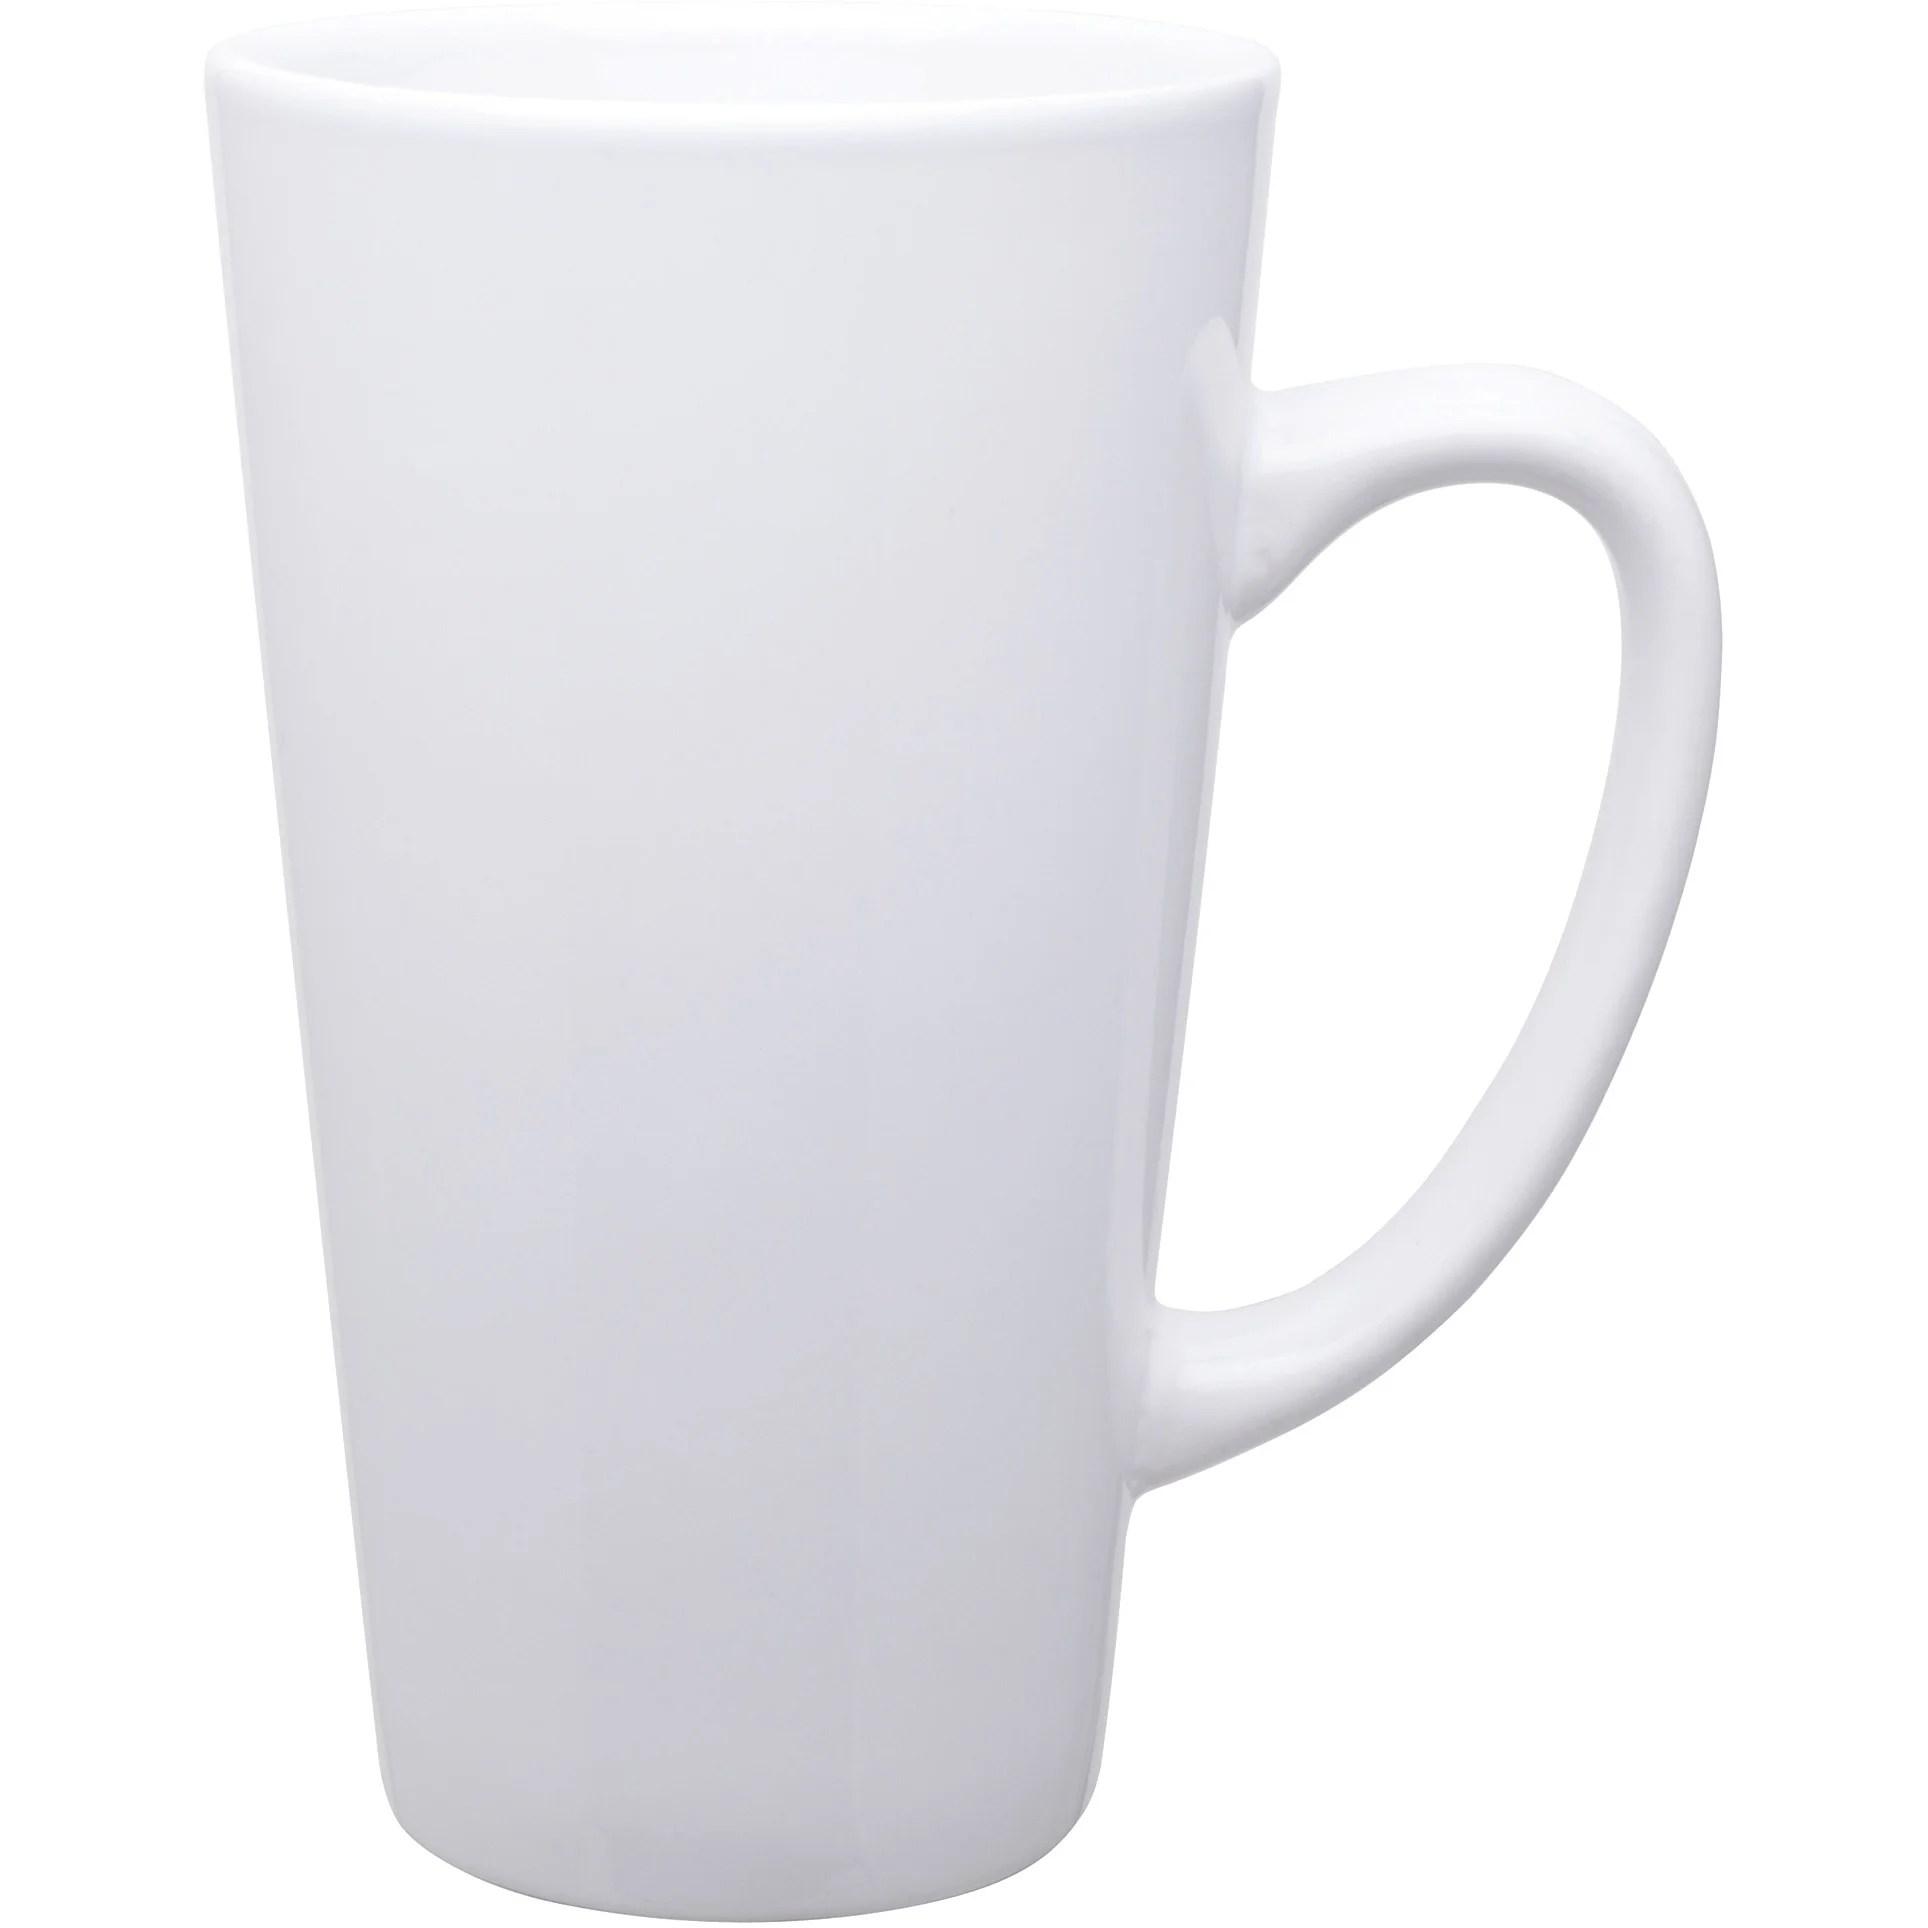 tall latte ceramic mug